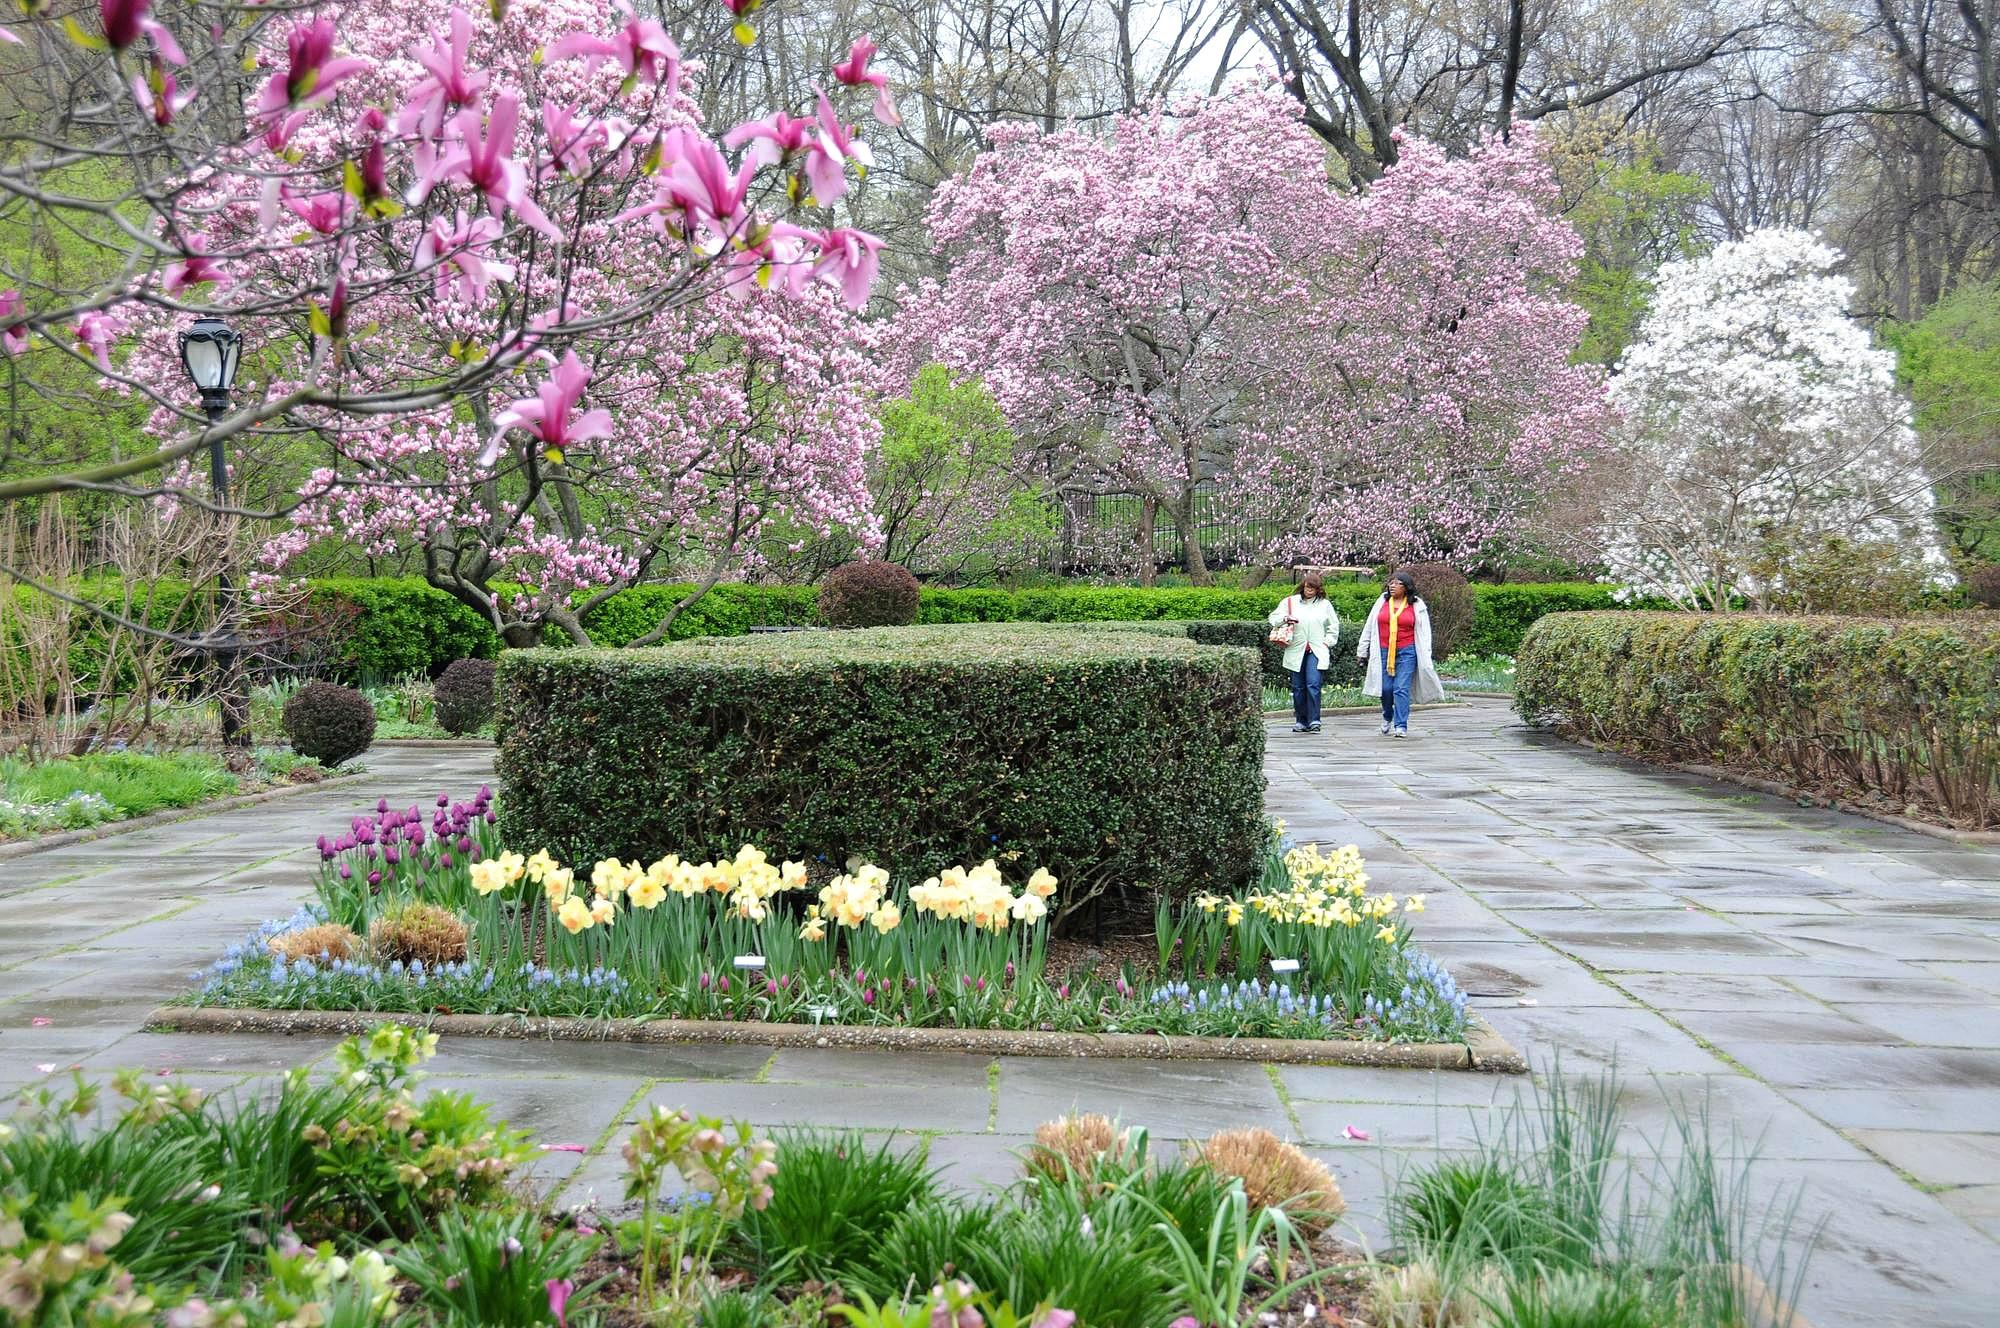 central park conservatory garden central park conservancy - Central Park Conservatory Garden